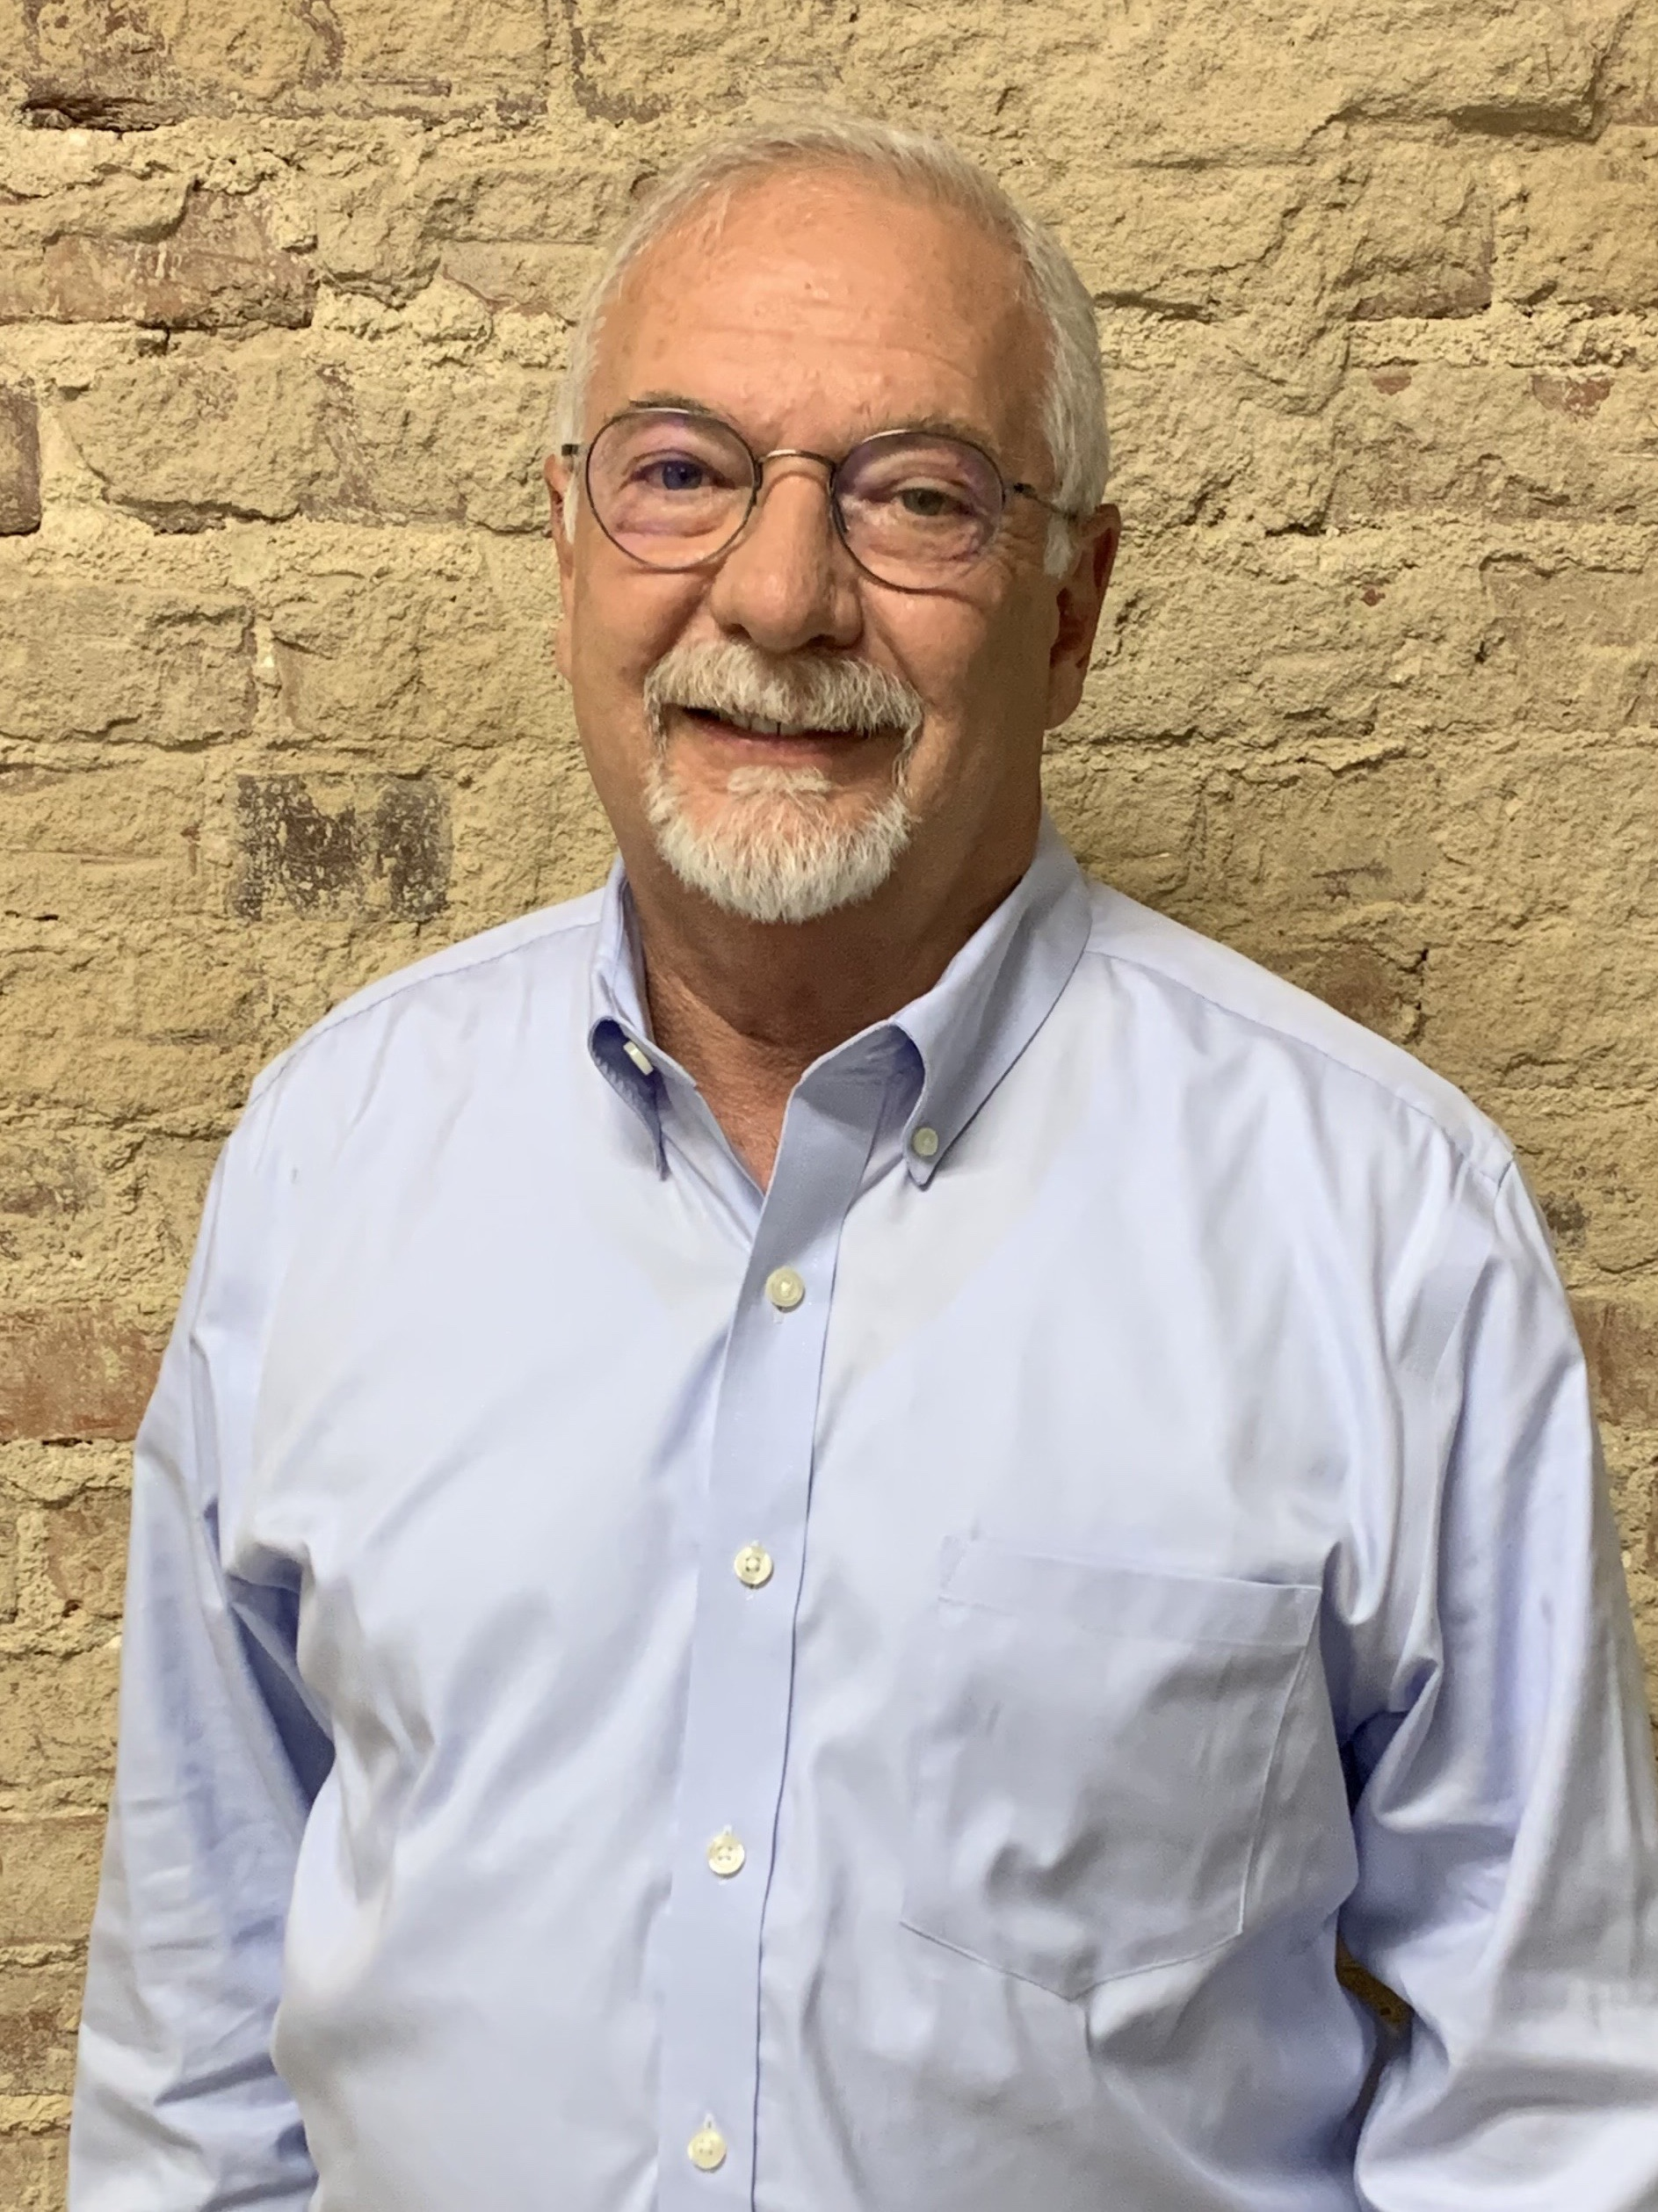 Gene McCord